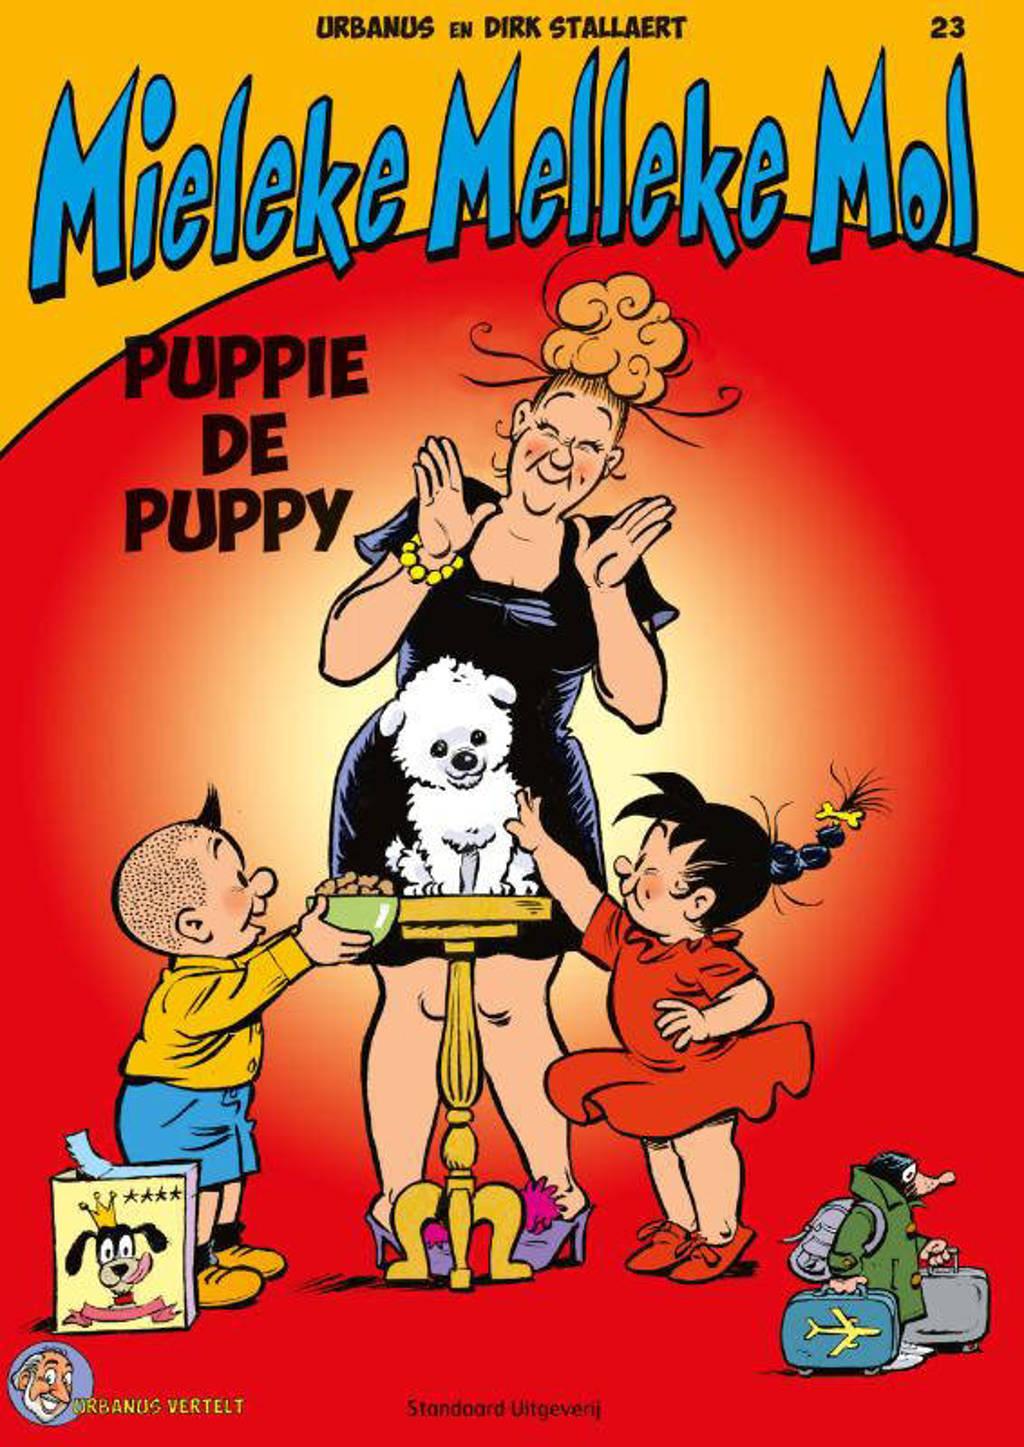 Mieleke Melleke Mol: Puppie de Puppy - Urbanus en Dirk Stallaert